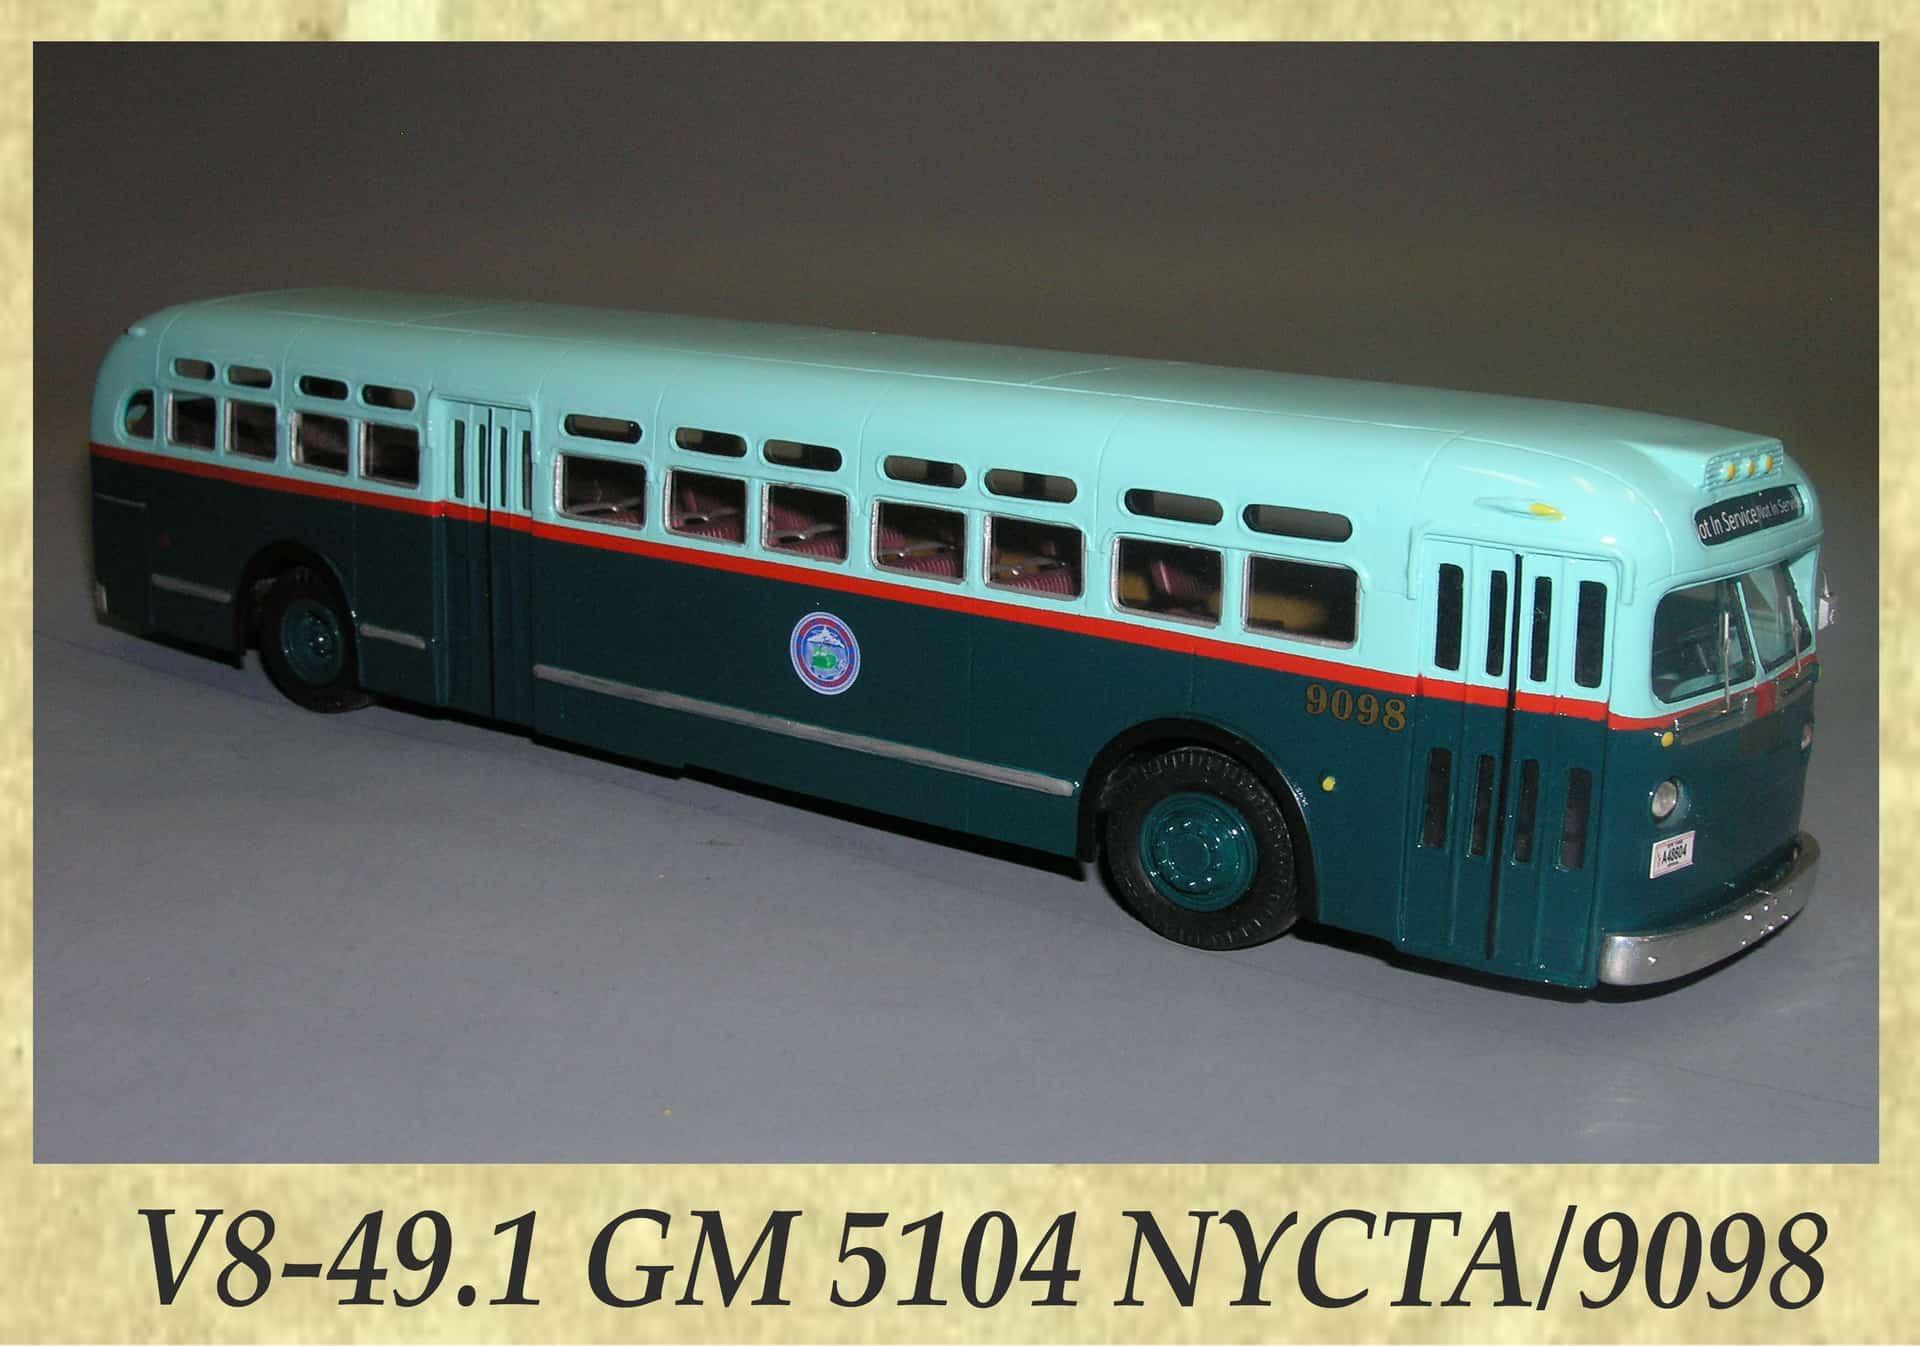 V8-49.1 GM 5104 NYCTA 9098